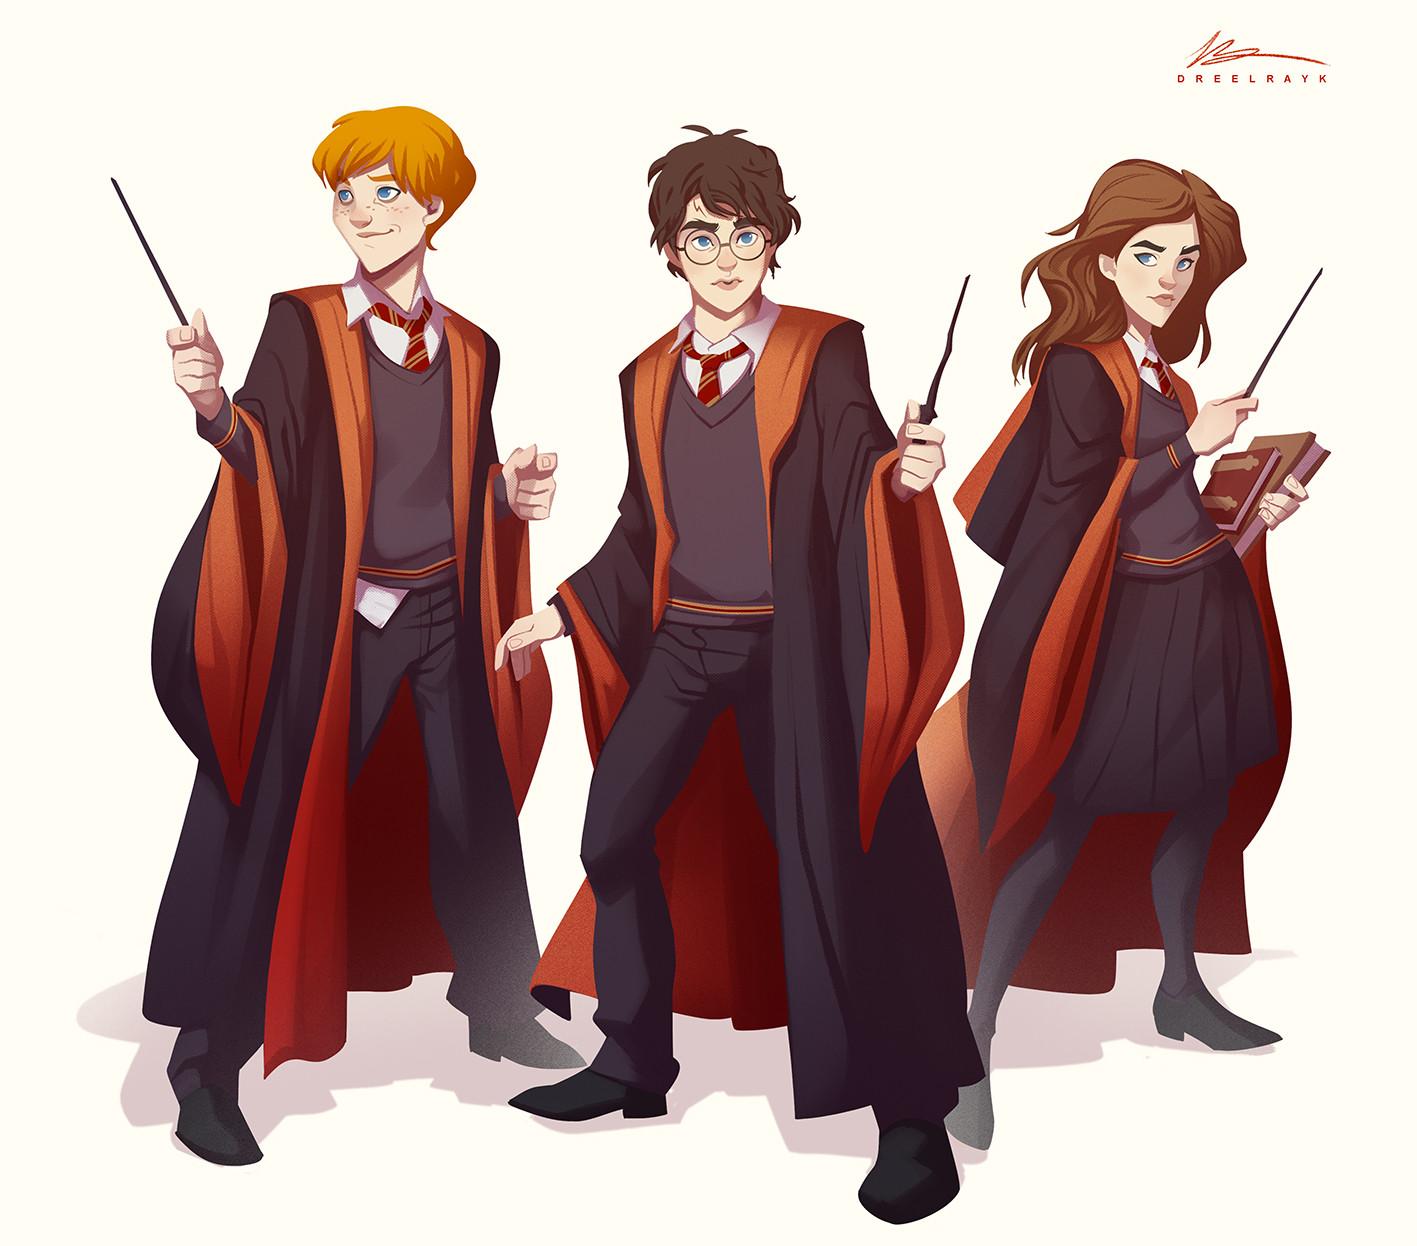 ArtStation - Harry Potter characters study - 01, Valerio ...